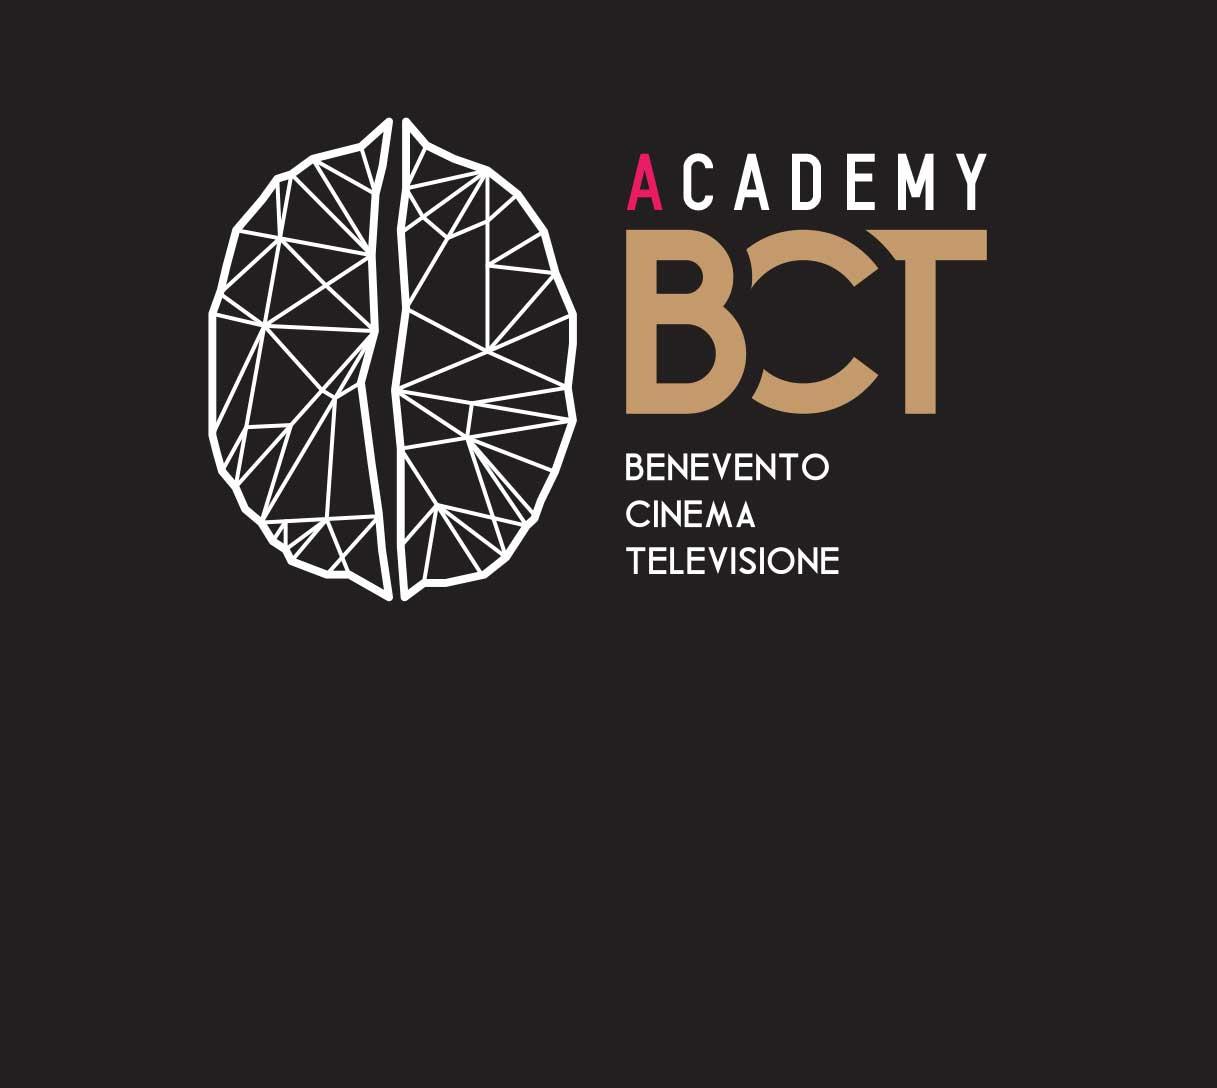 BCT Academy